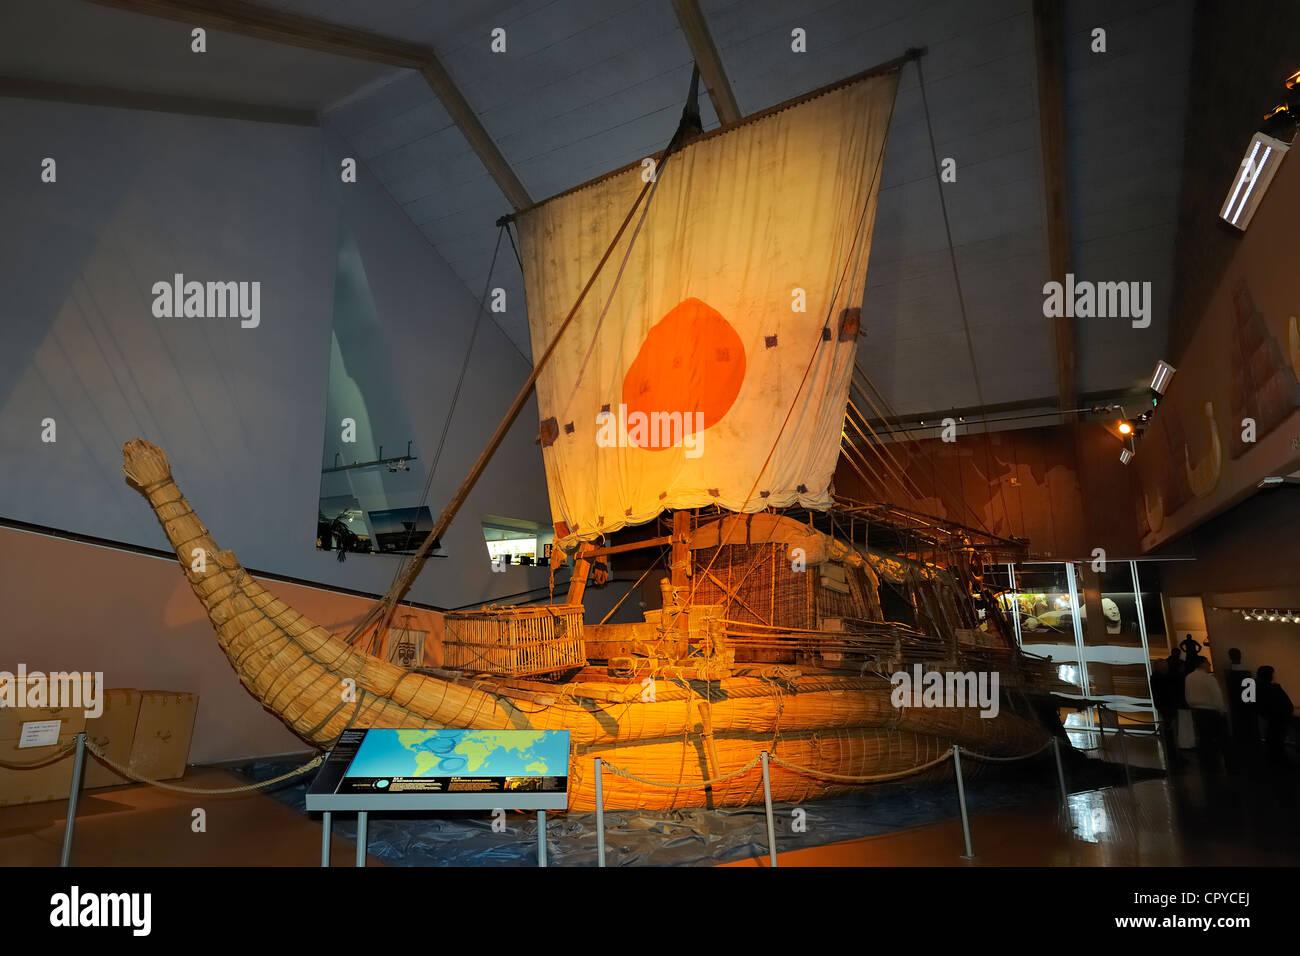 Norway Oslo Bygdoy Peninsula Kon-Tiki Museum Ra II ship of Thor Heyerdahl replica of former egyptien papyrus boat - Stock Image